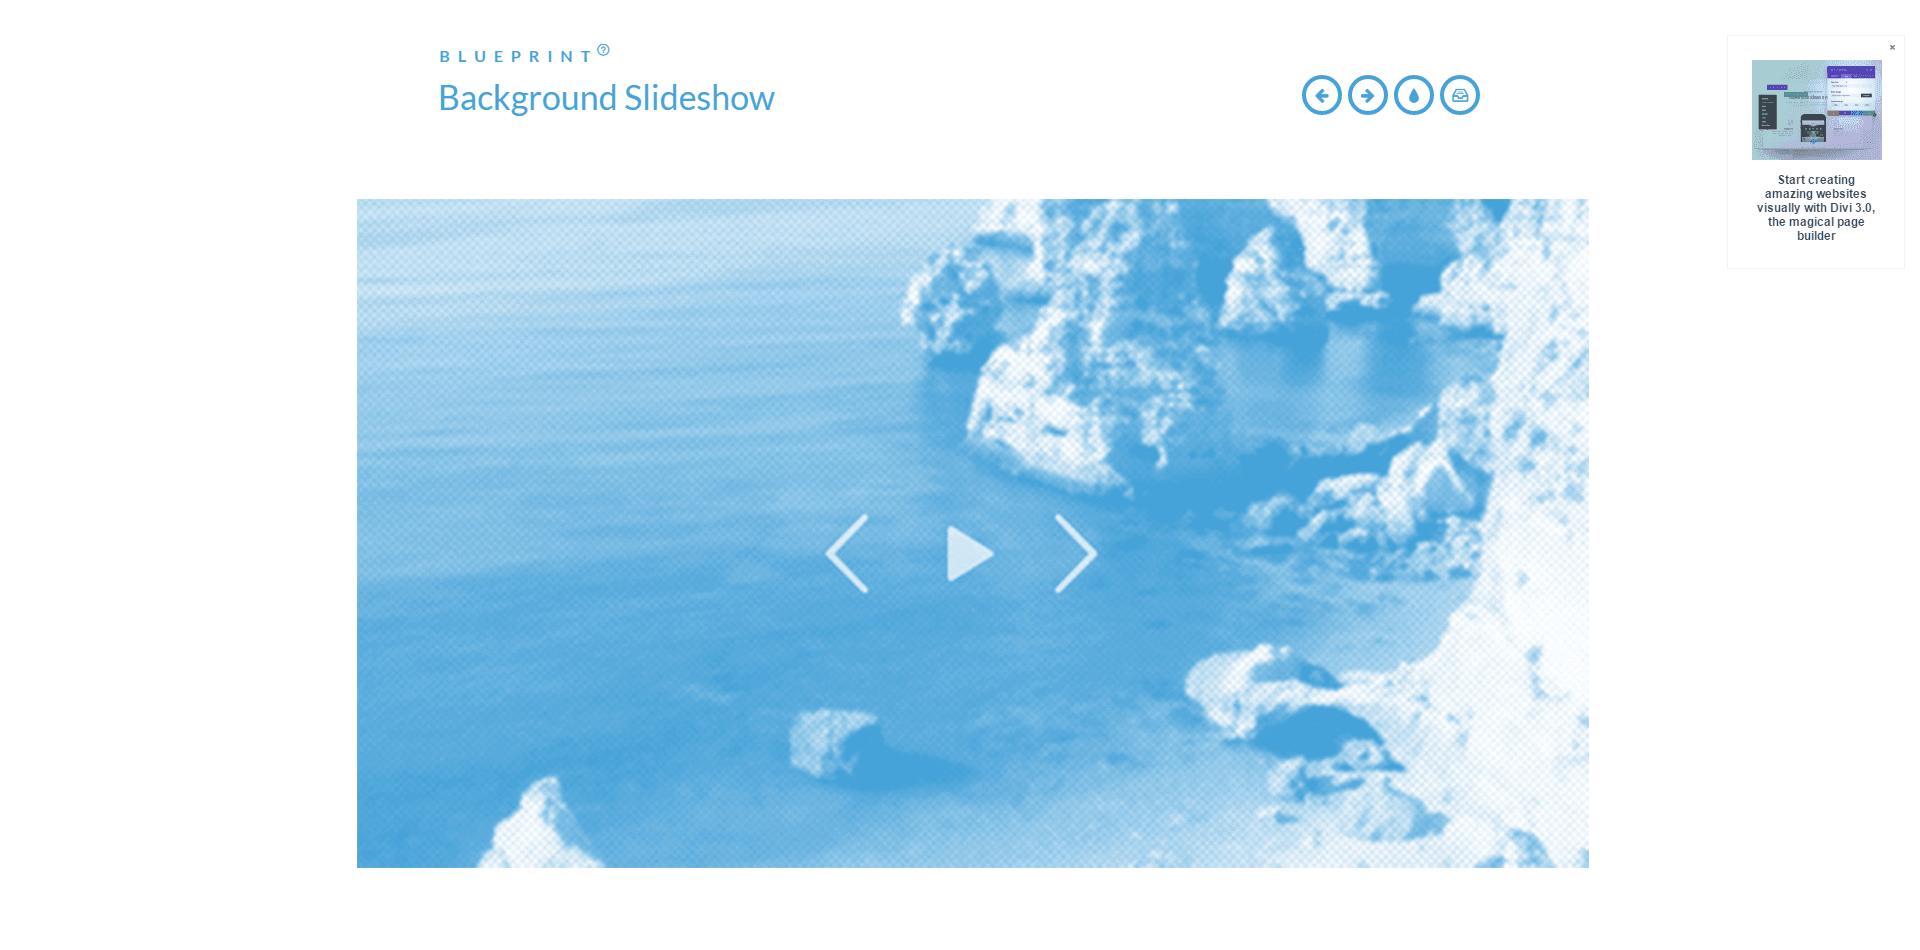 背景幻灯片-Background Slideshow